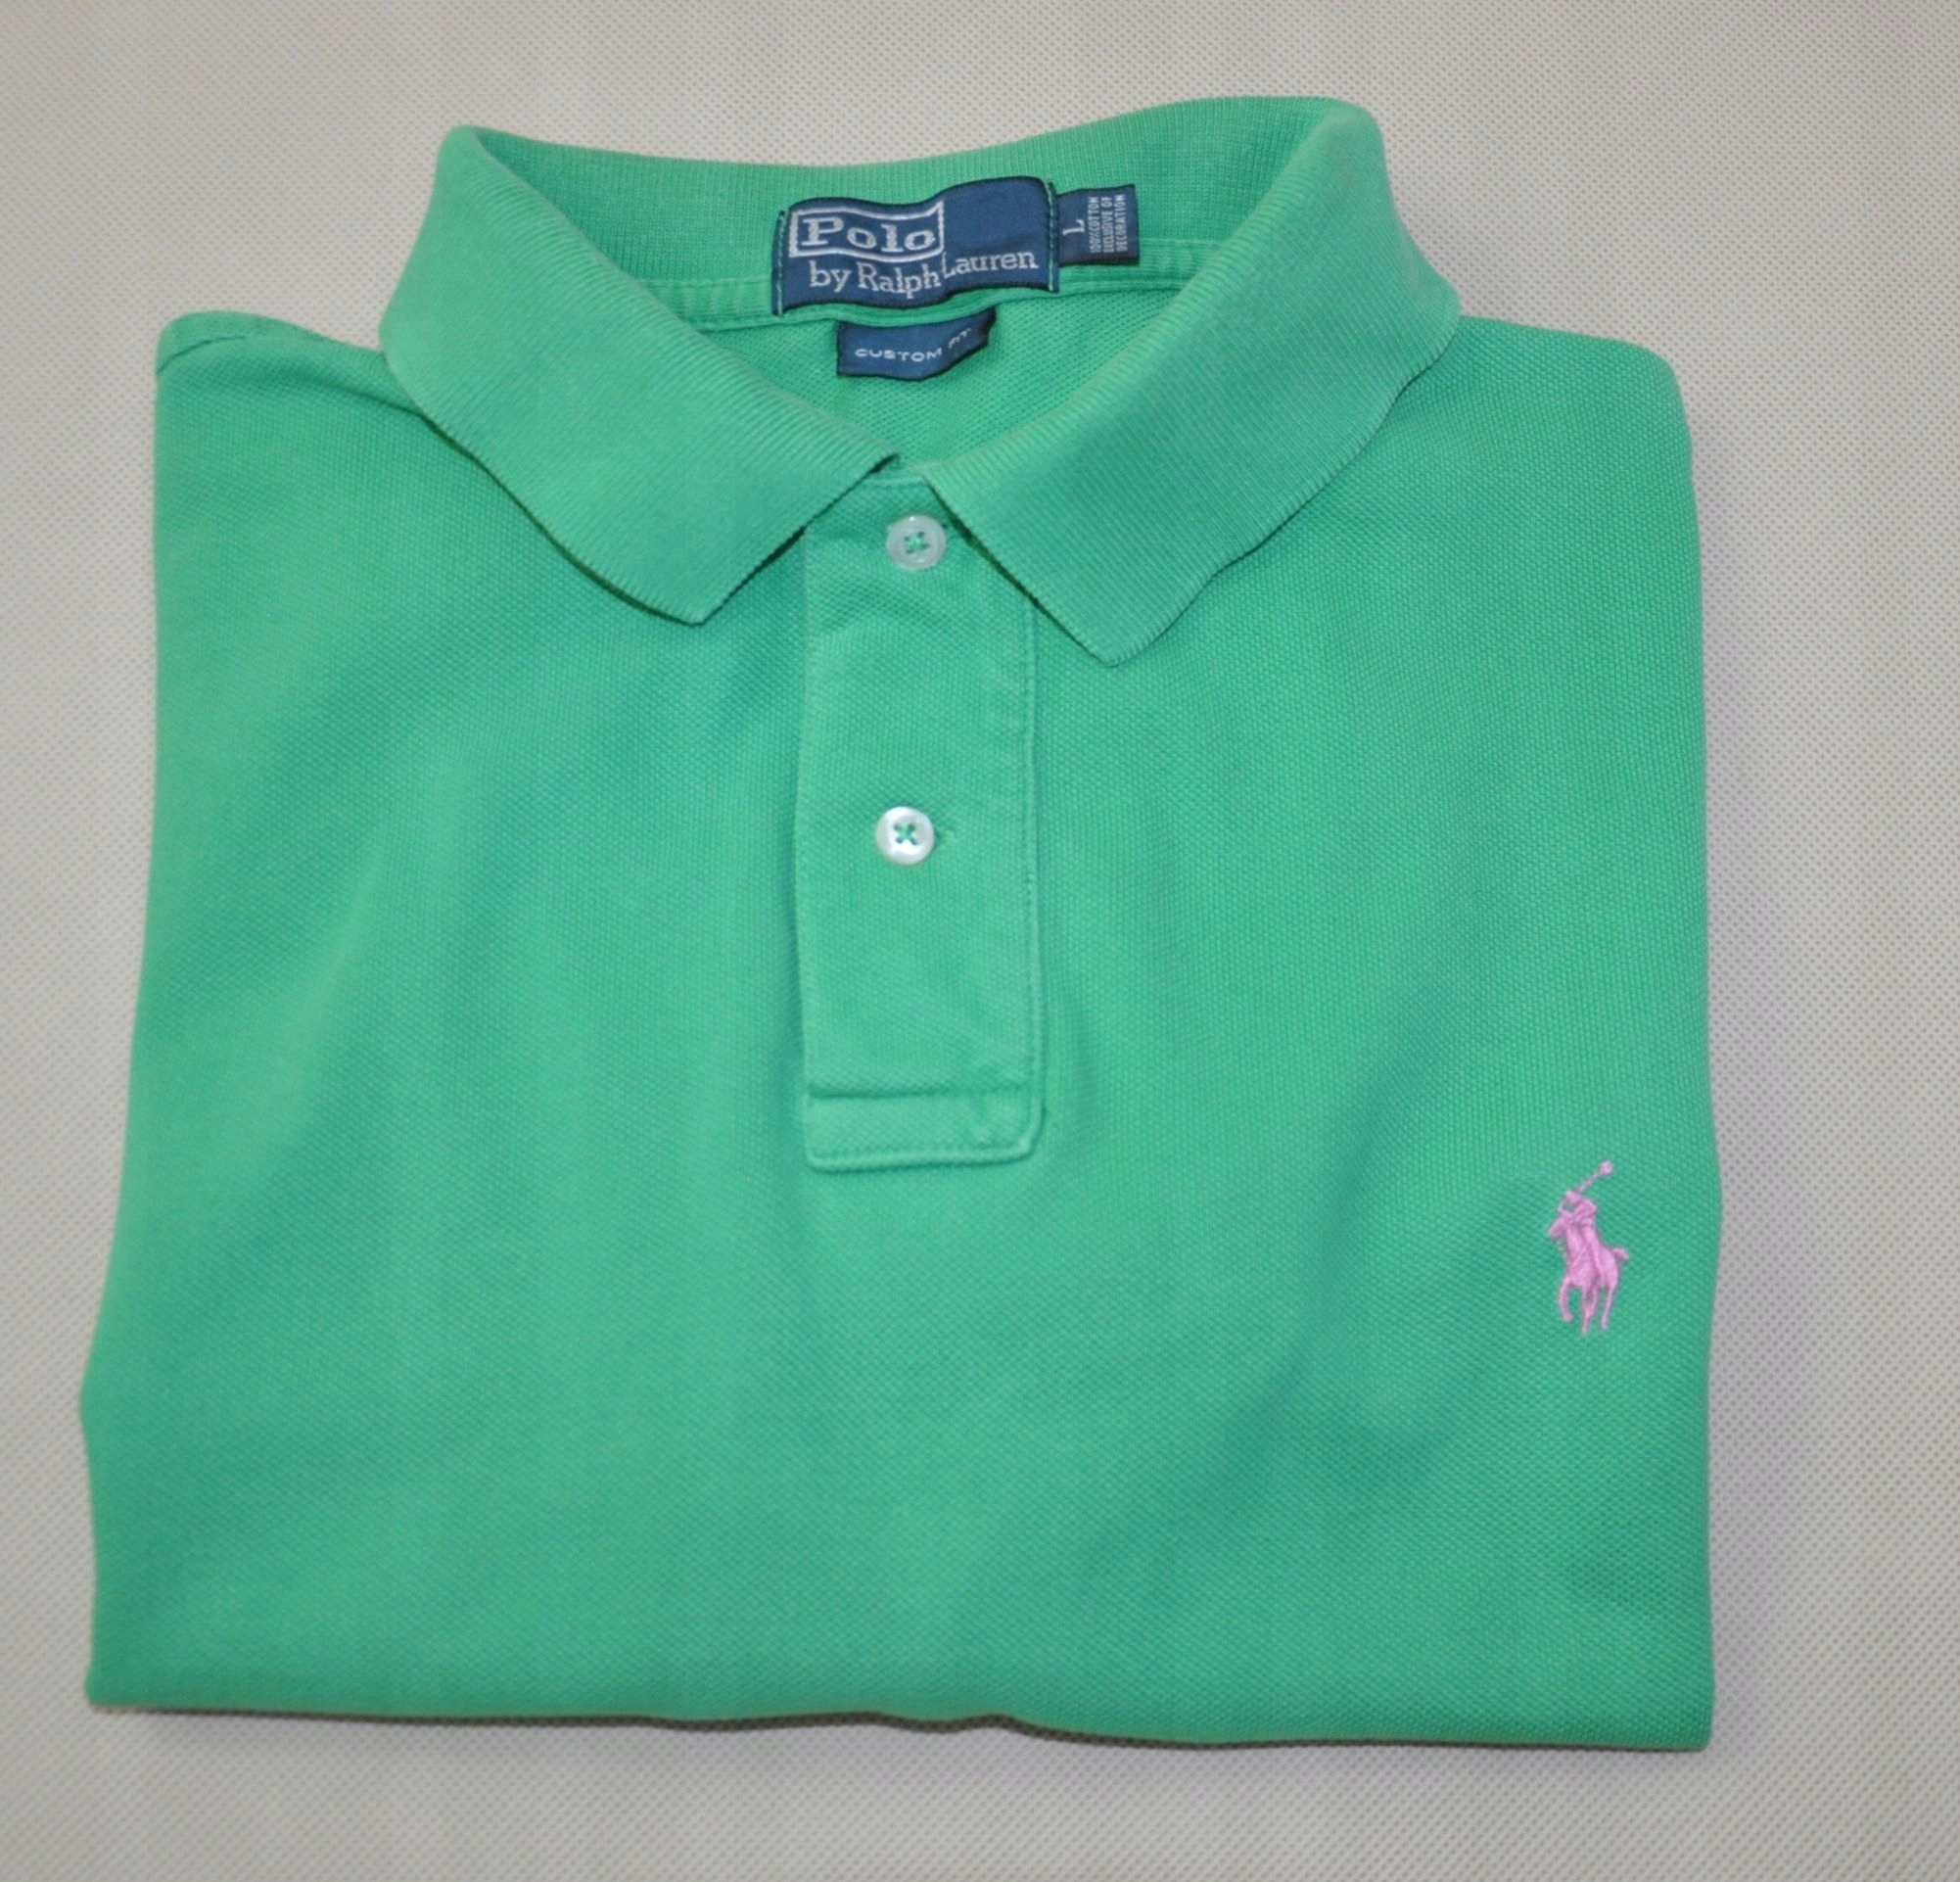 03c41c333 POLO RALPH LAUREN koszulka męska polo zielona L - 7597085515 ...